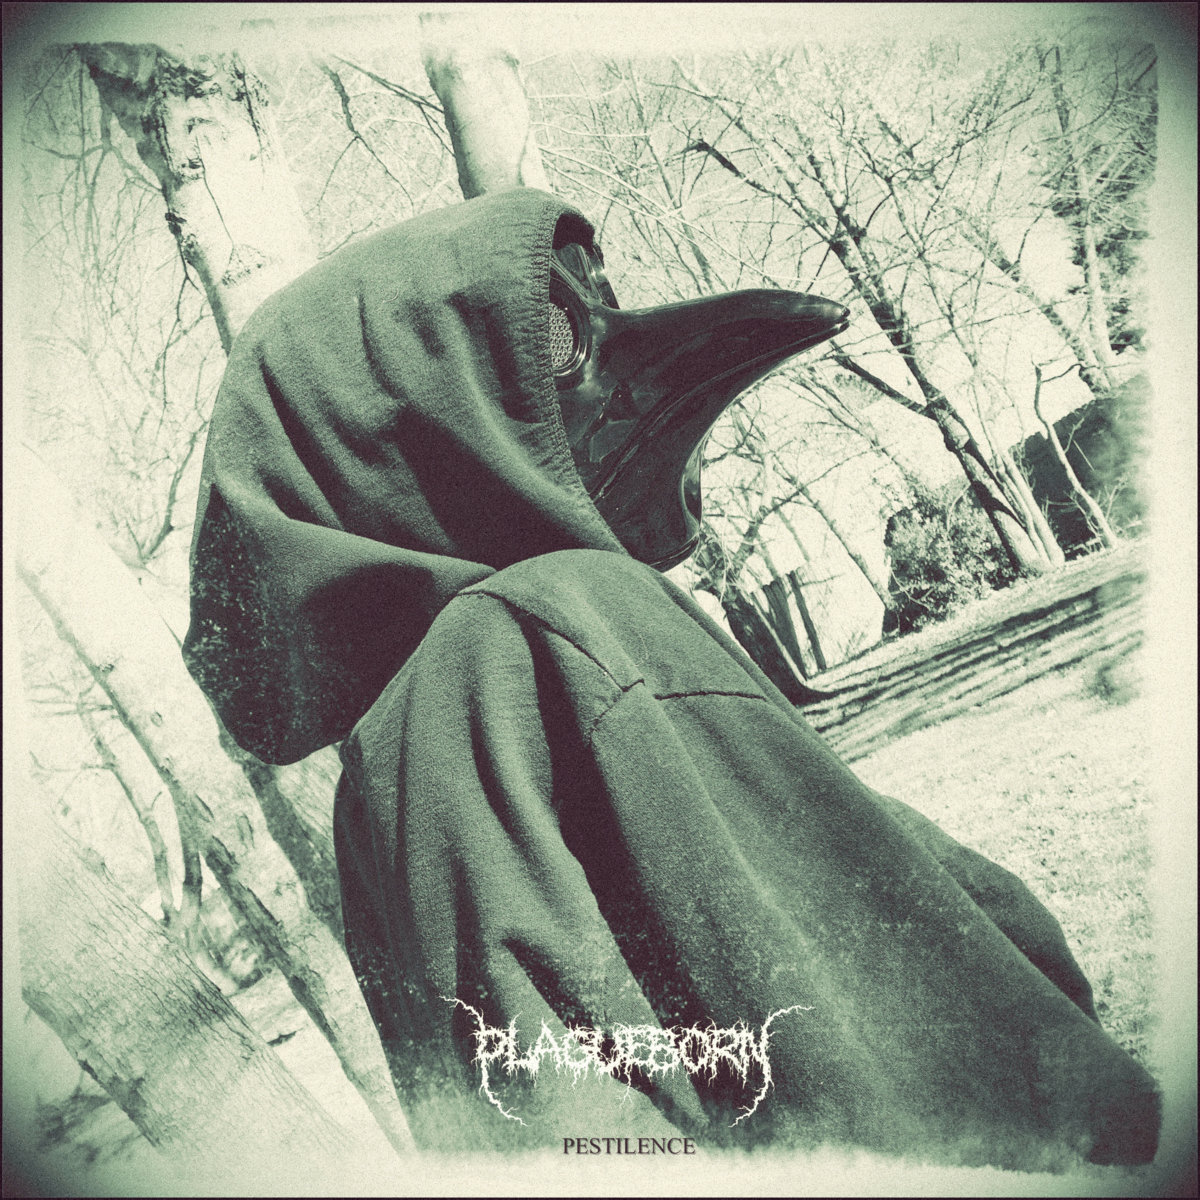 PlagueBorn - Pestilence [EP] (2019)